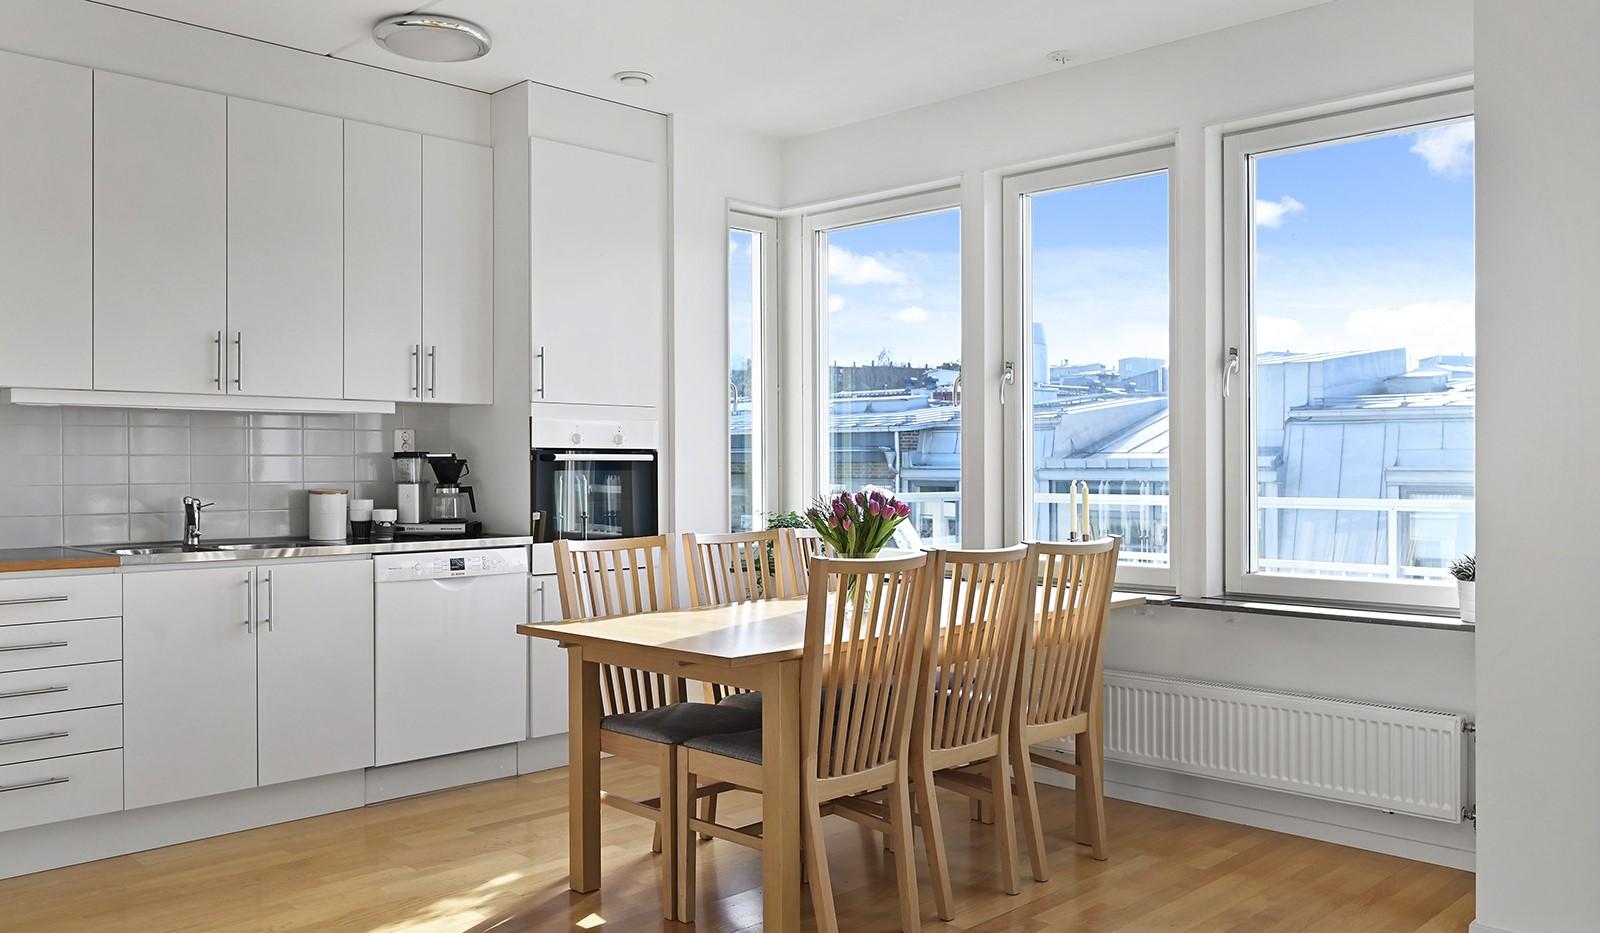 Blekegatan 1, 6 tr - I köket ryms en ordentlig matplats